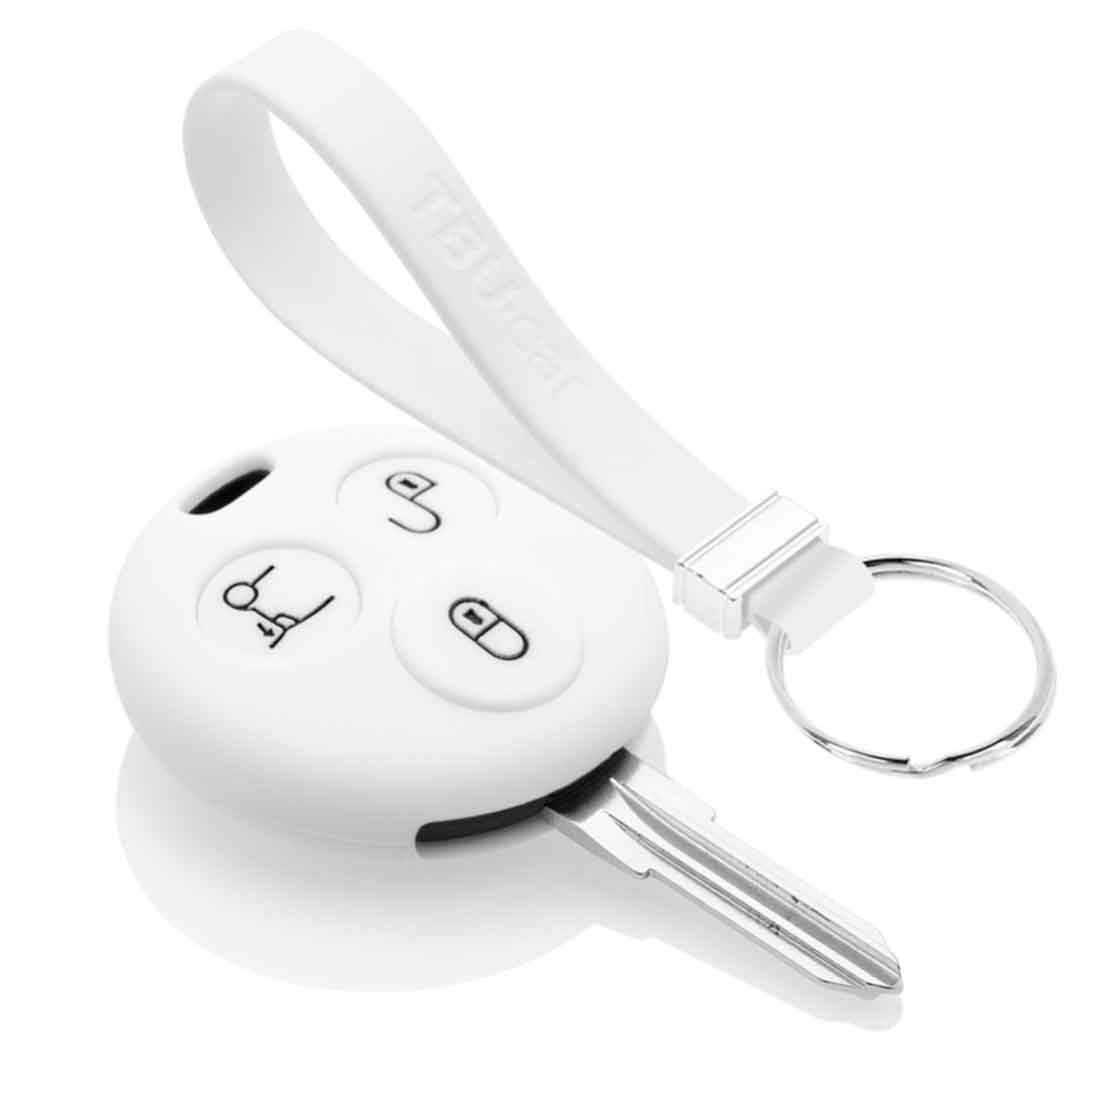 TBU car TBU car Autoschlüssel Hülle kompatibel mit Smart 3 Tasten - Schutzhülle aus Silikon - Auto Schlüsselhülle Cover in Weiß